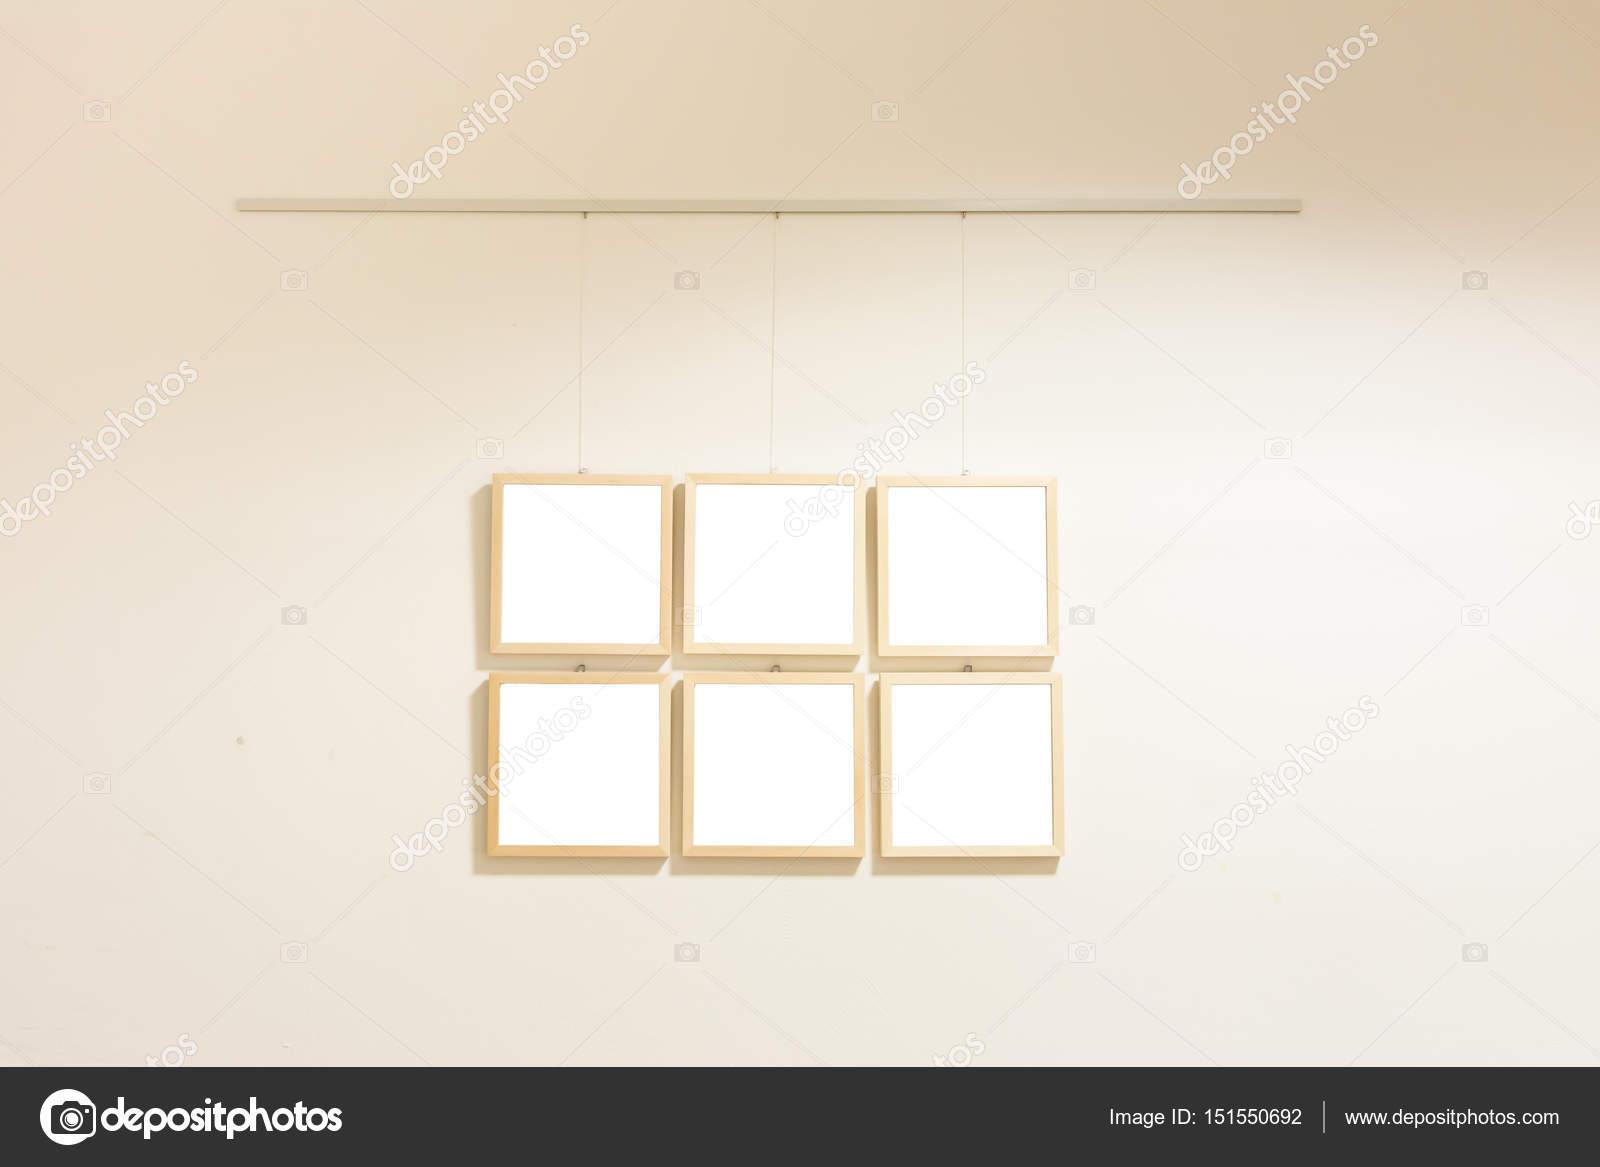 Museo de arte contemporáneo de pequeño moderno pantalla marcos en ...